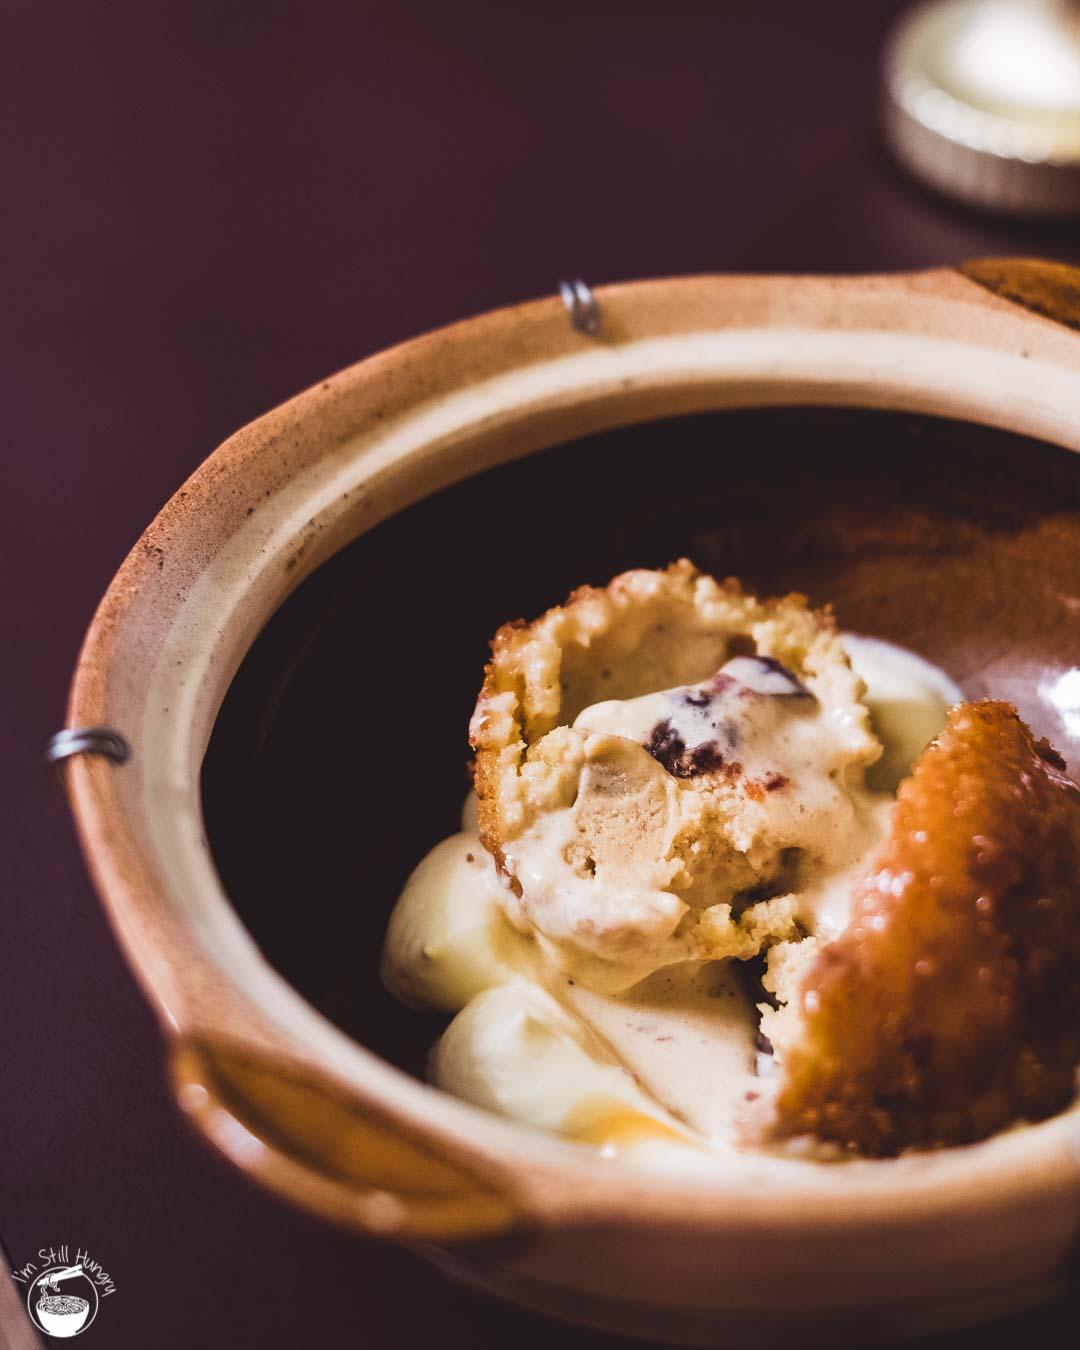 Jade Temple Sydney Neil Perry Fried vanilla & date ice cream w/maple sauce